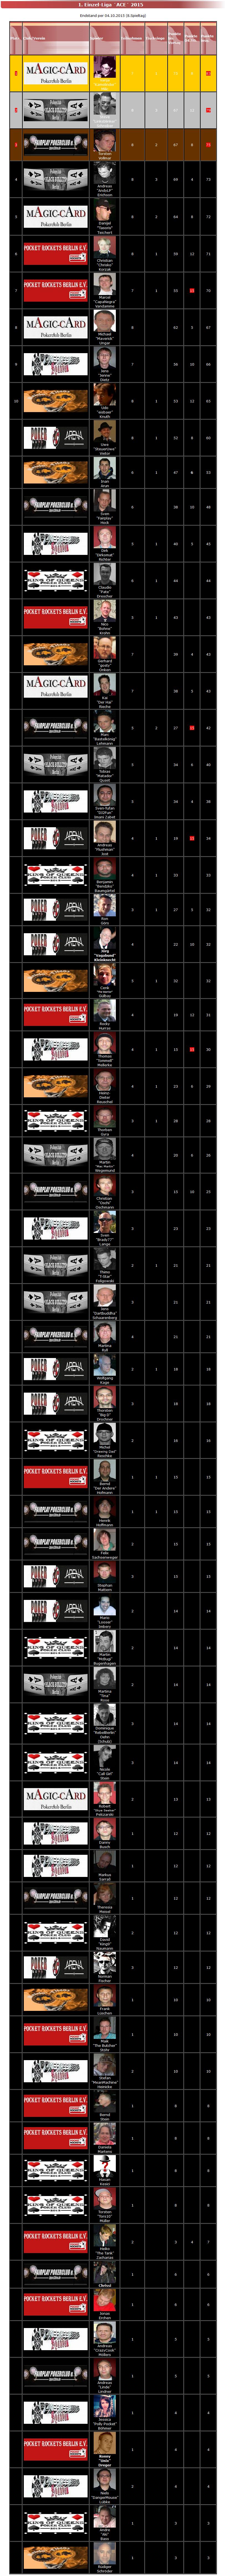 Poker Verband Berlin - Einzel Liga Ace 2015